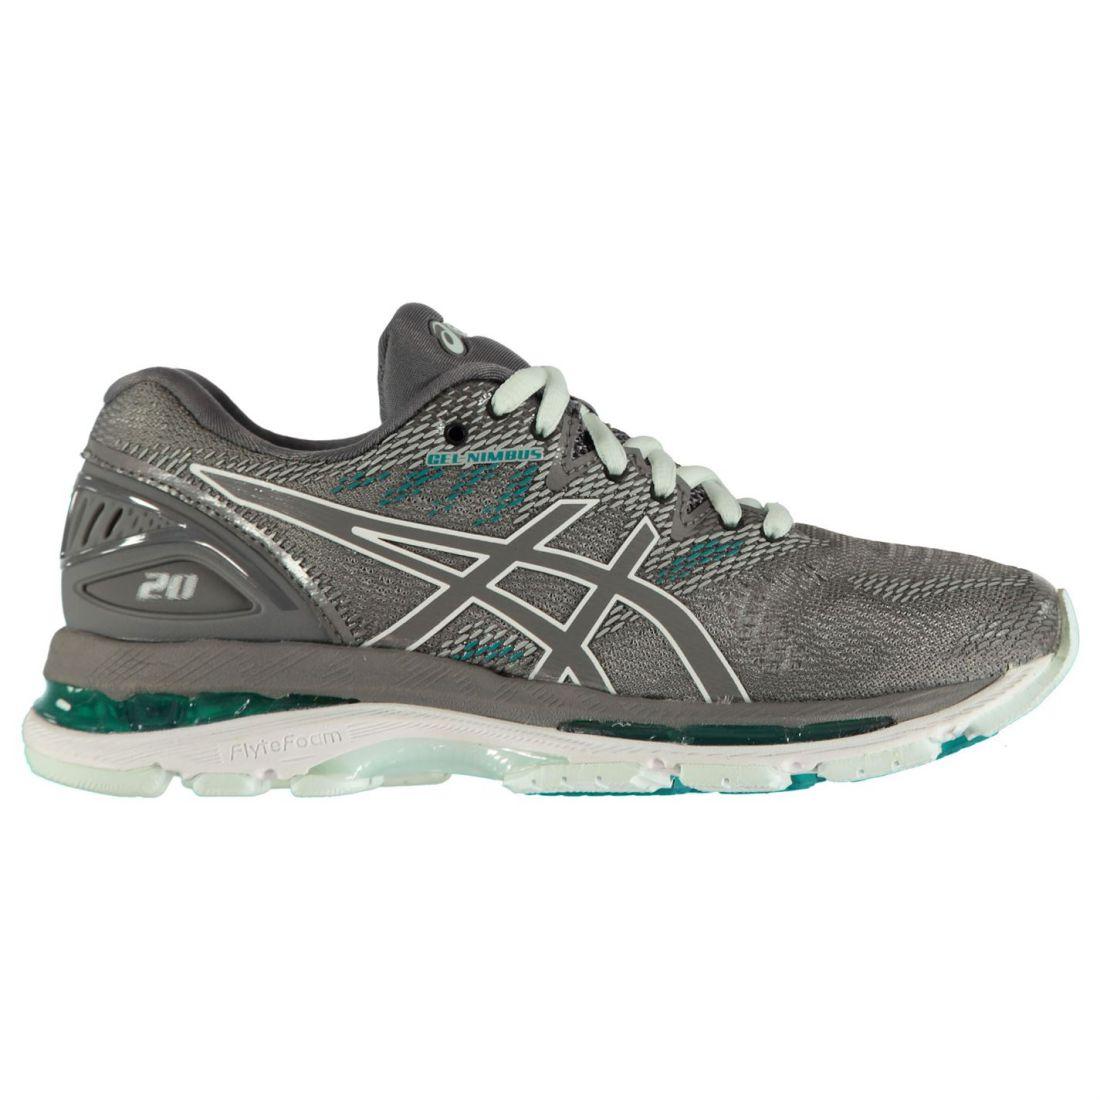 f7149833e928 Asics Womens Gel Nimbus 20 Running Shoes Road Lightweight Ortholite ...